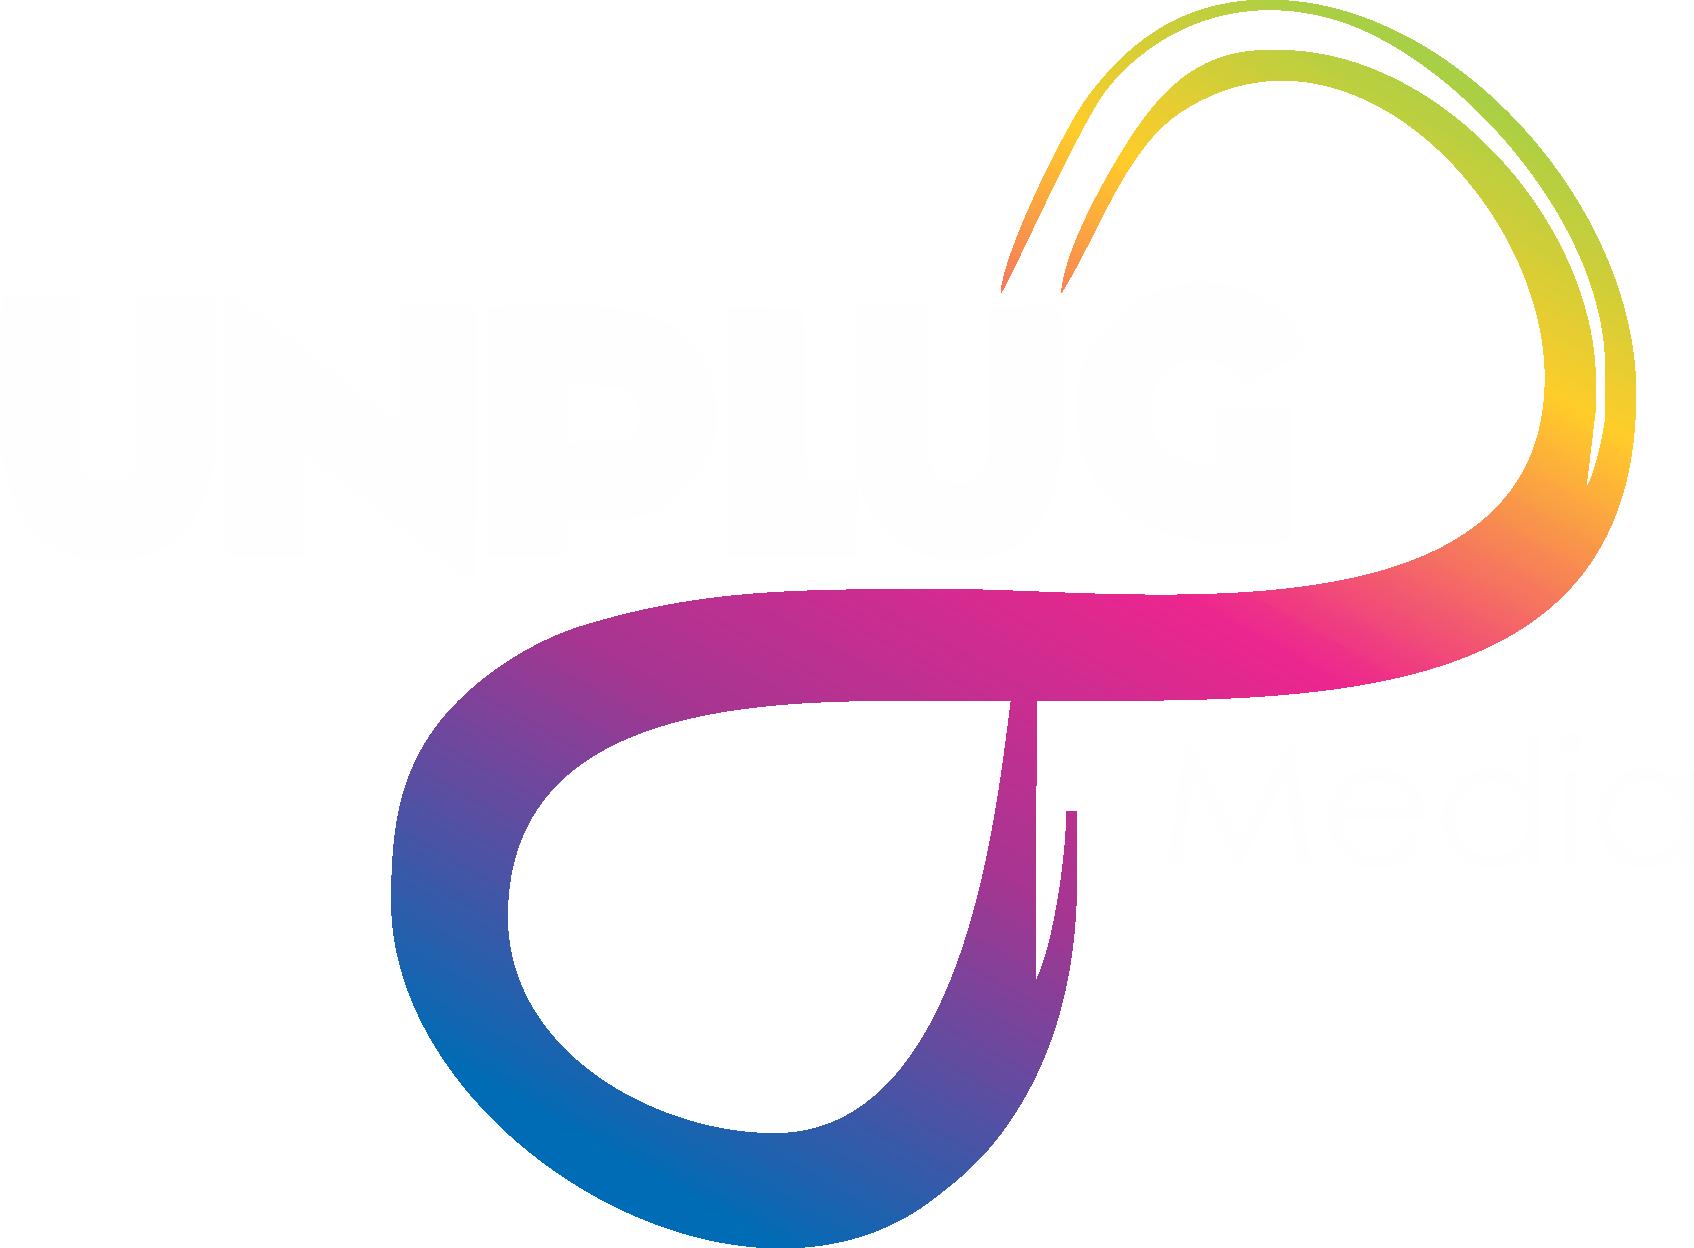 Unpluge Logo Png.